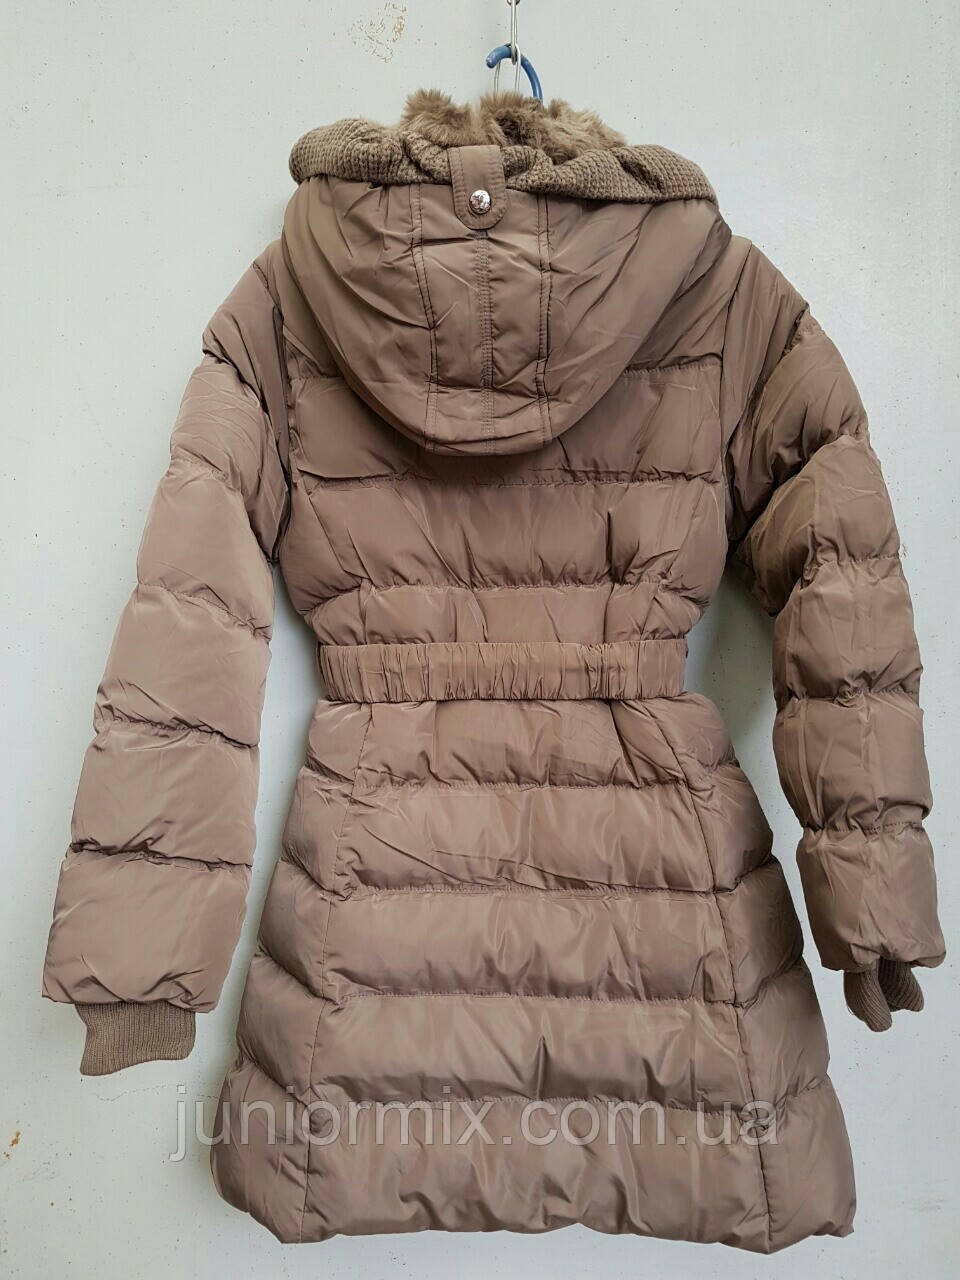 4a0d80d3ad82 Куртка зимняя на девочку под пояс TYK.